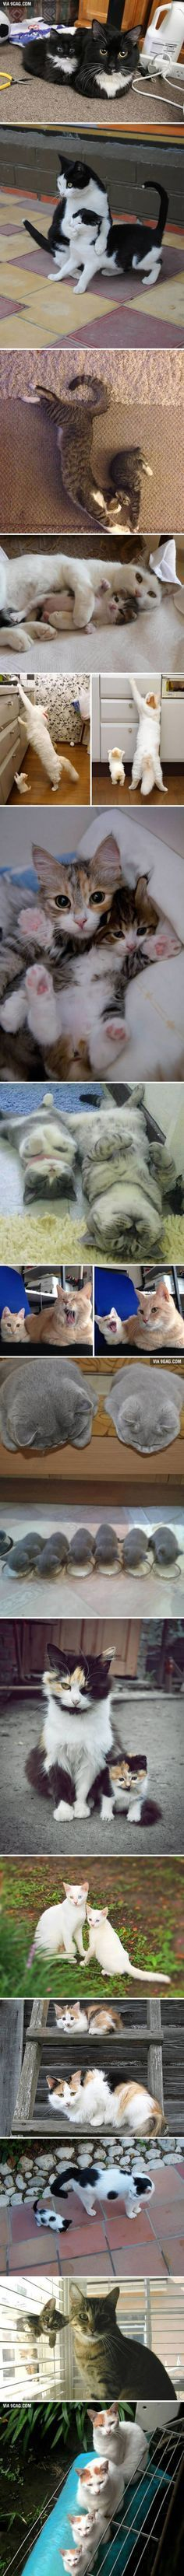 15 Cats With Their Cute Mini-Me (mini-meows)